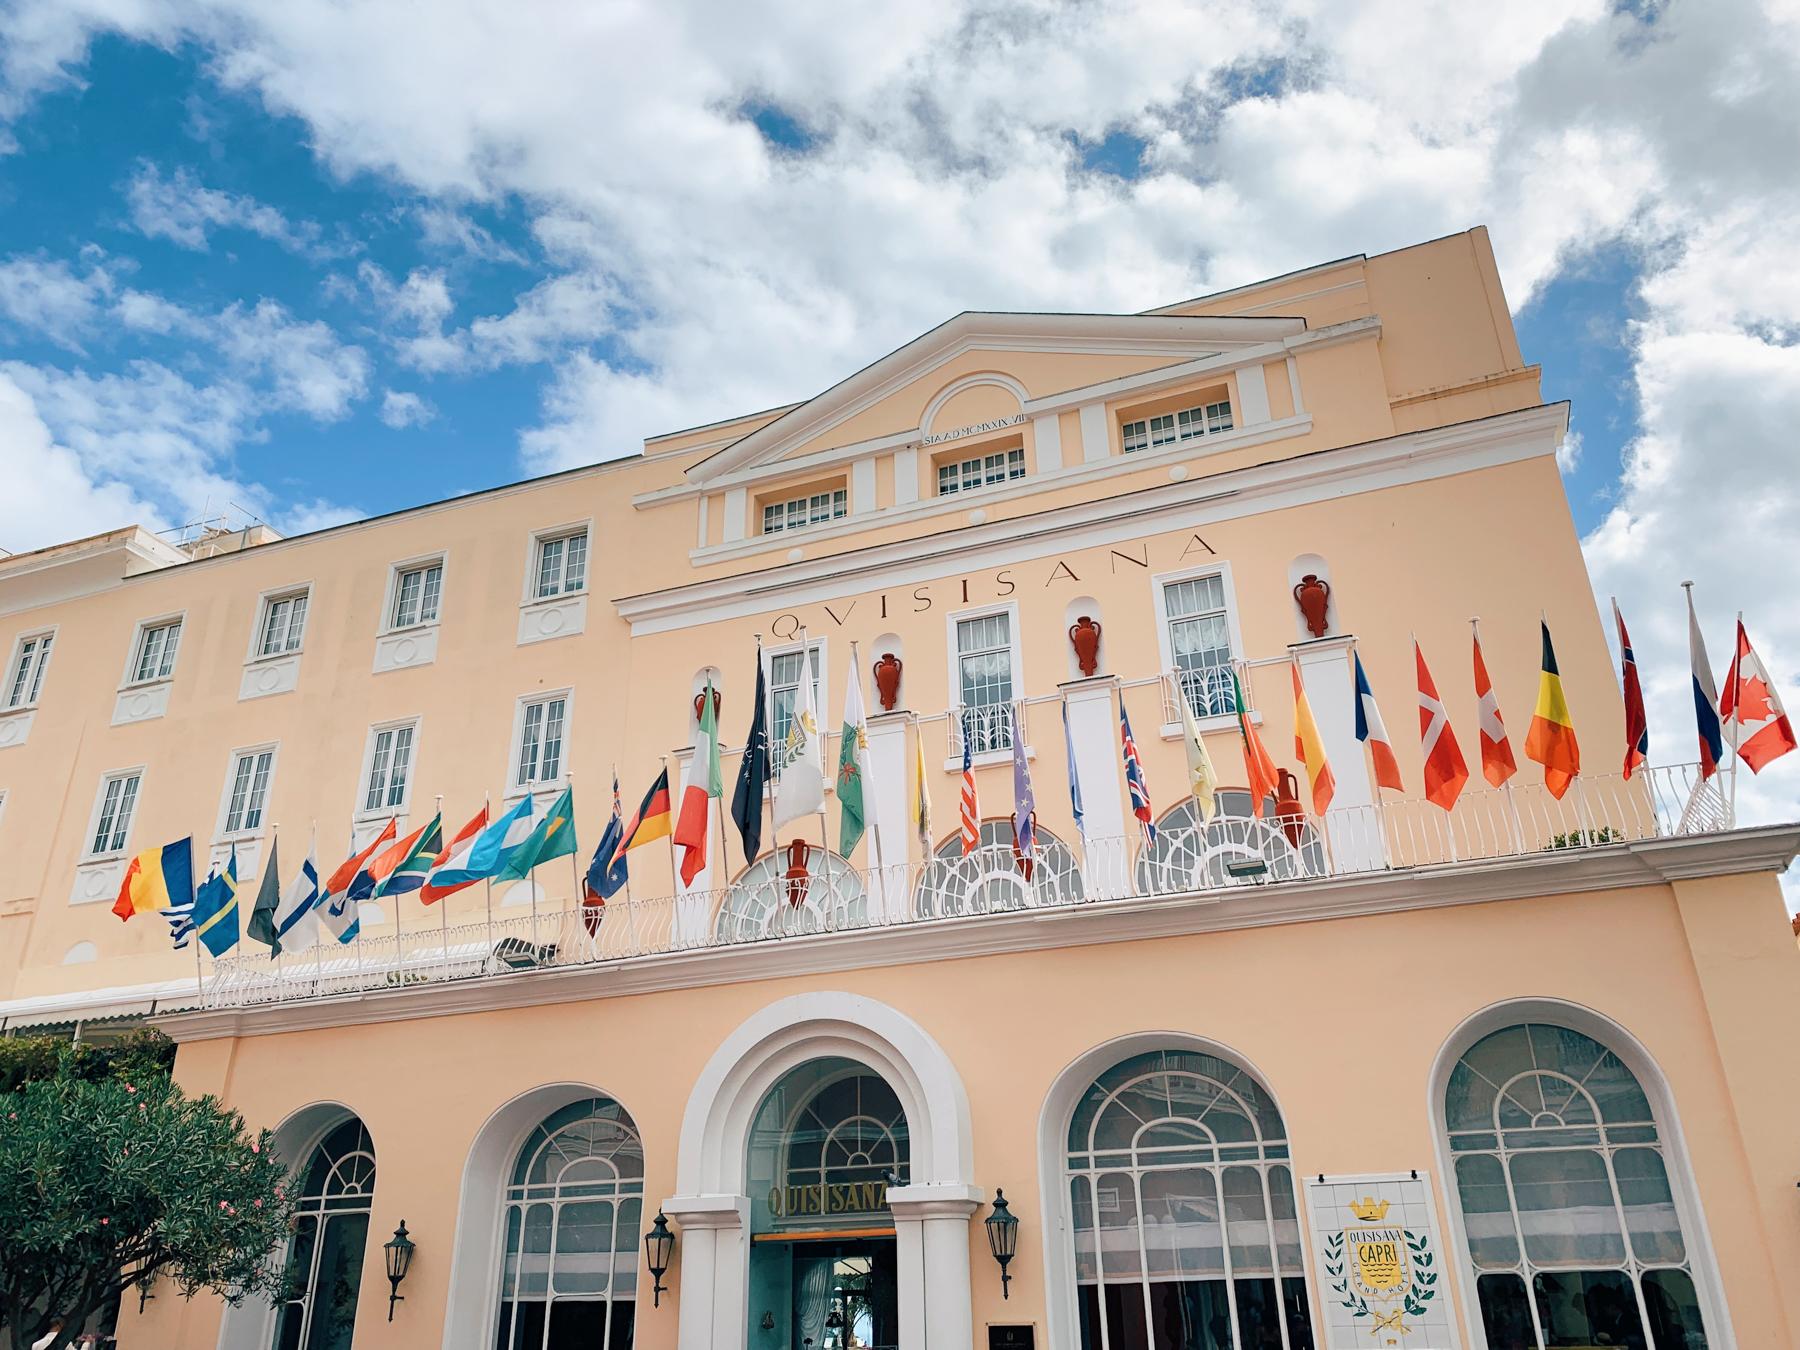 The Grand Hotel Quisisana.